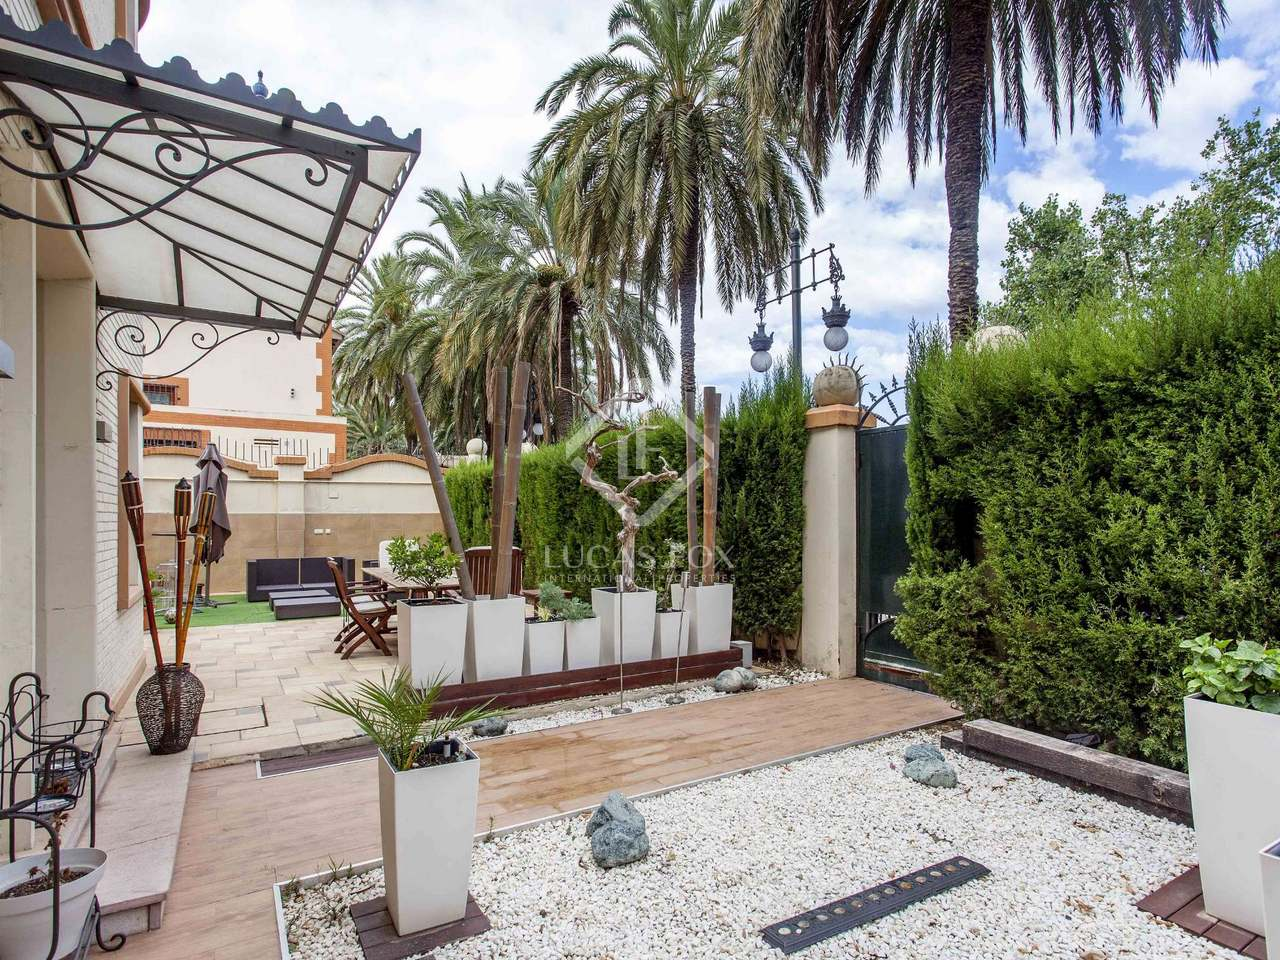 Maison villa de 225m a vendre el pla del real avec for Piscine jardin valence